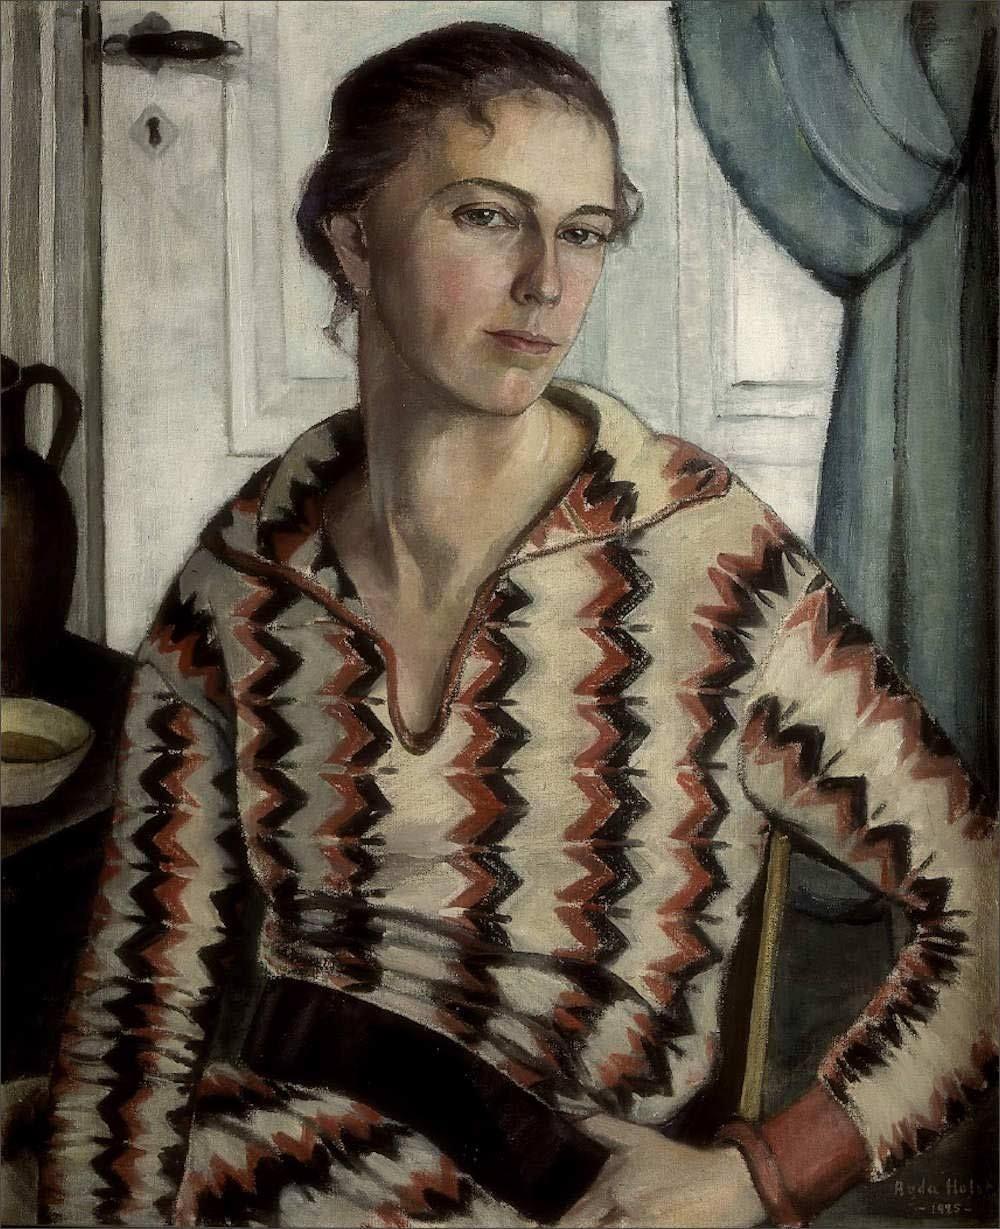 Agda Holst · Self Portrait · 1925 · Unknown location